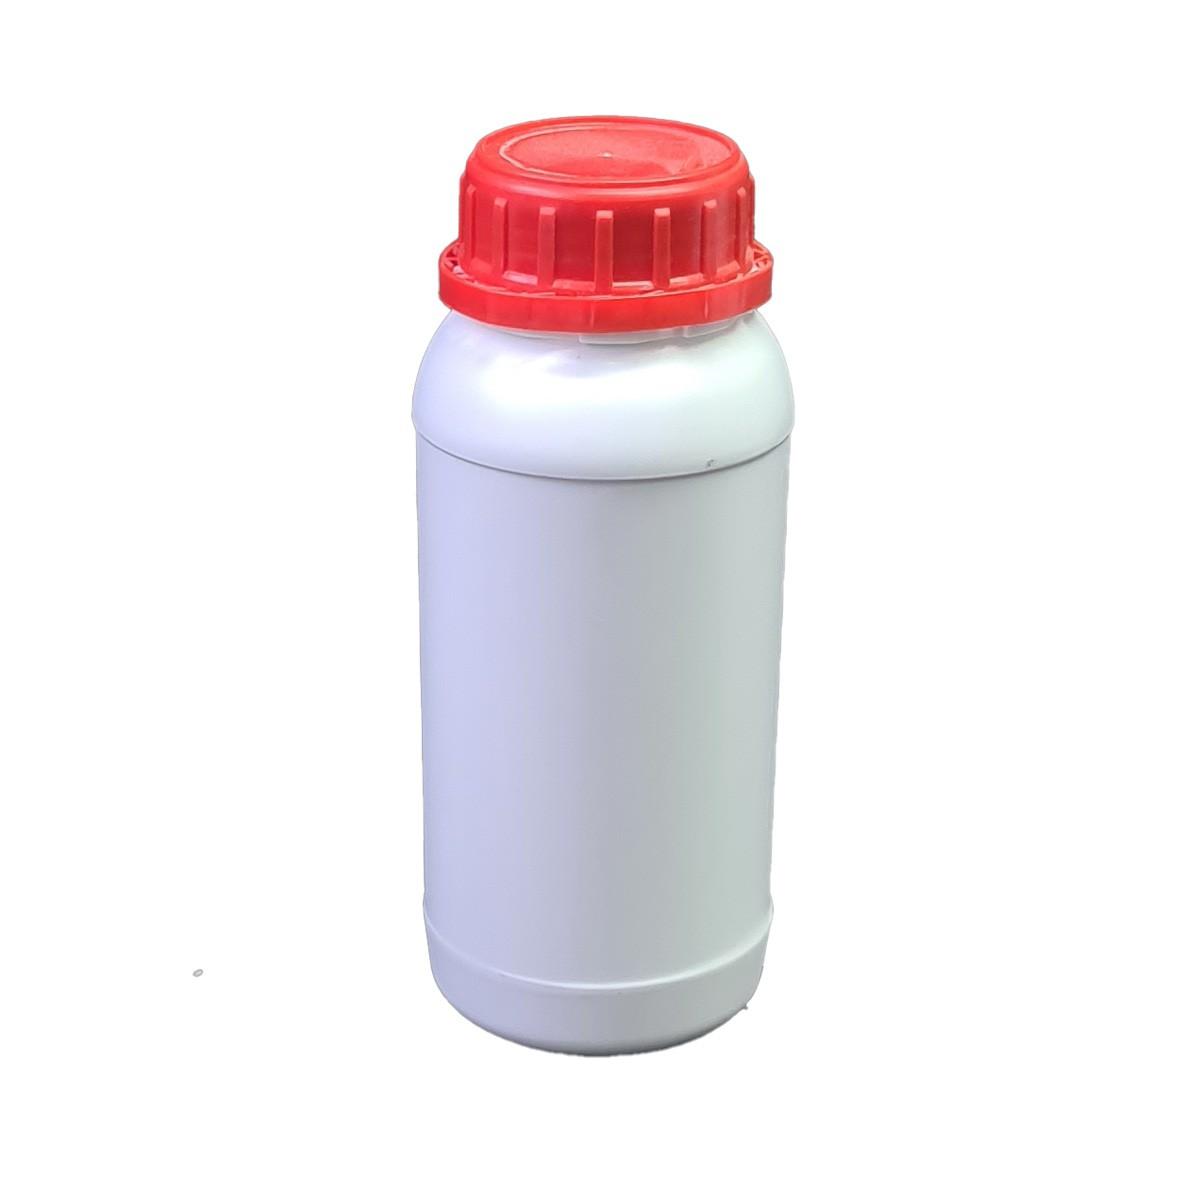 500ml meio litro de tinta Magenta para recarga de cartuchos